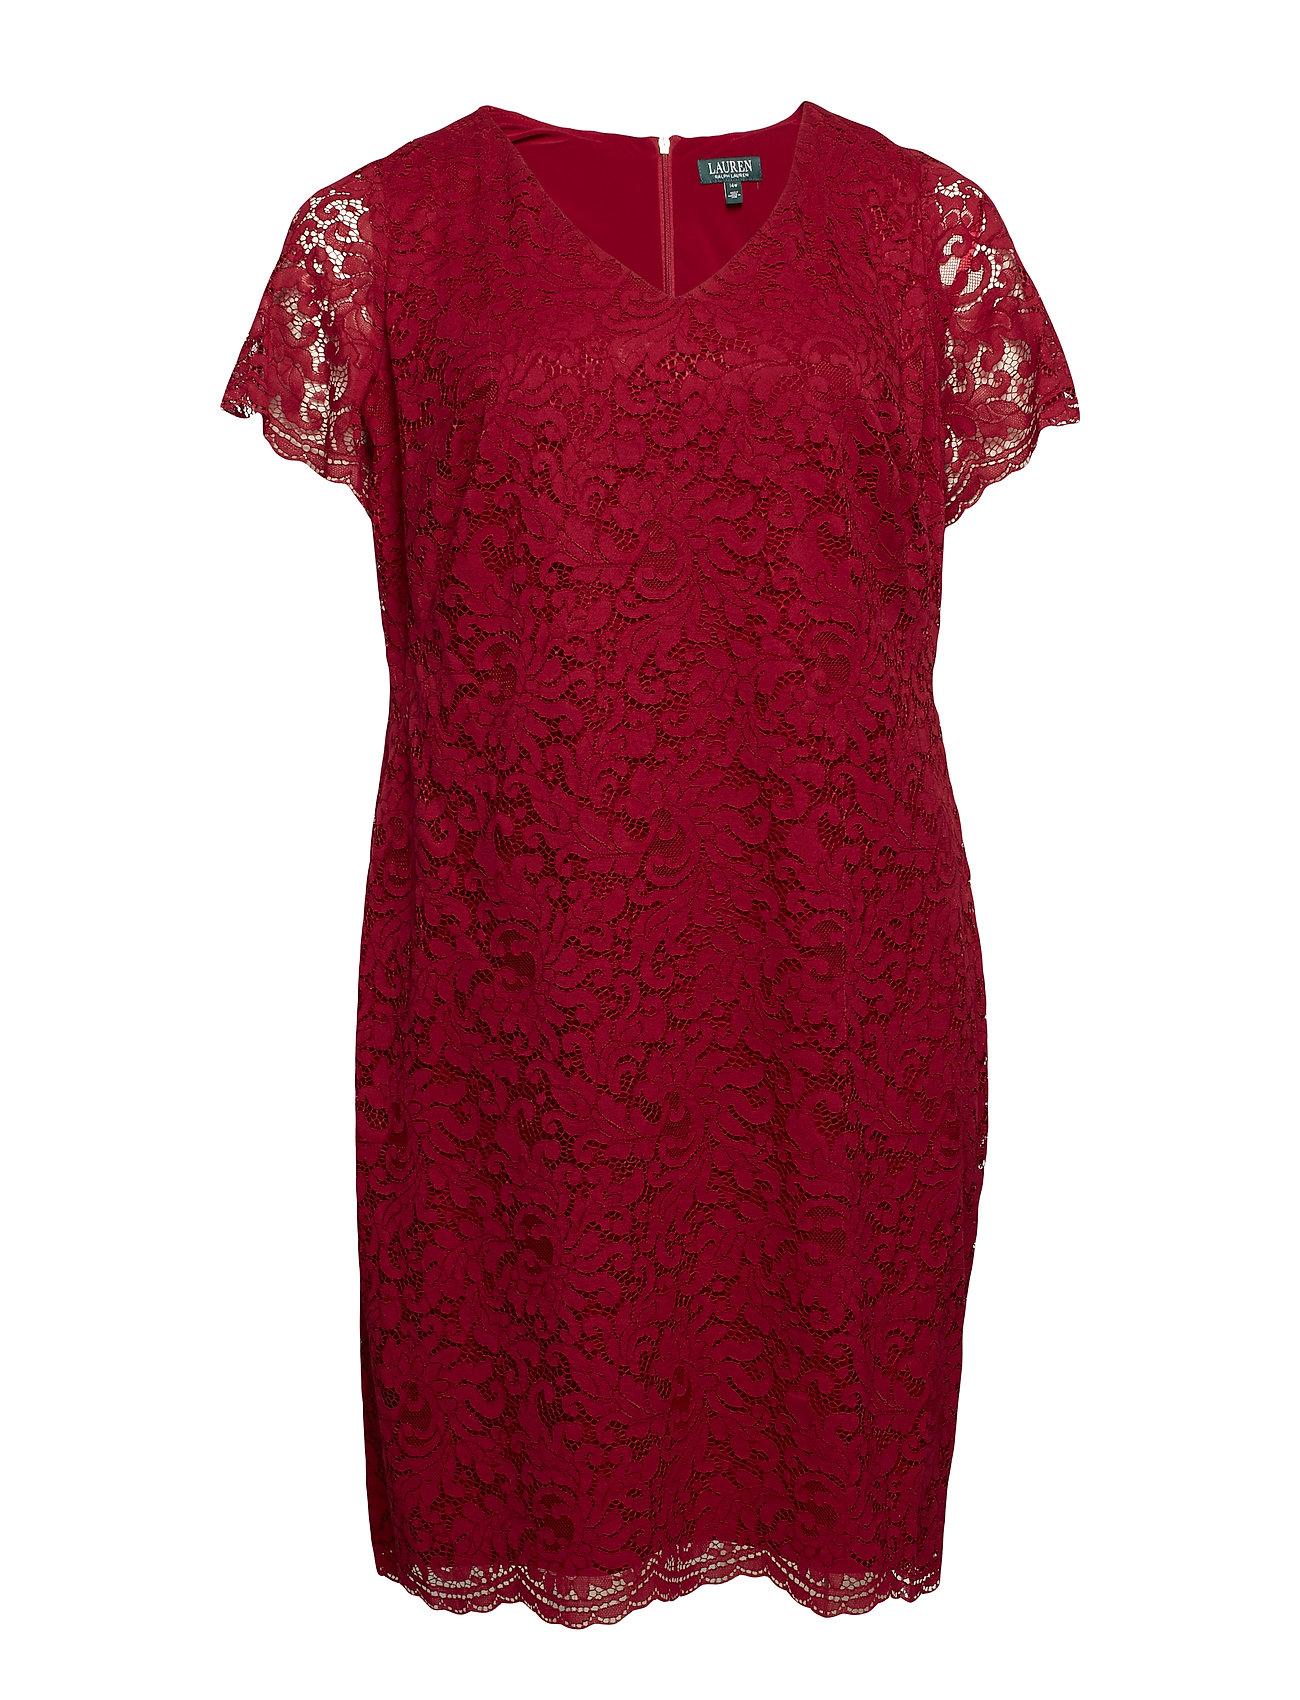 GarnetLauren size Lace Dressvibrant Women Plus Scalloped XOPuZikT